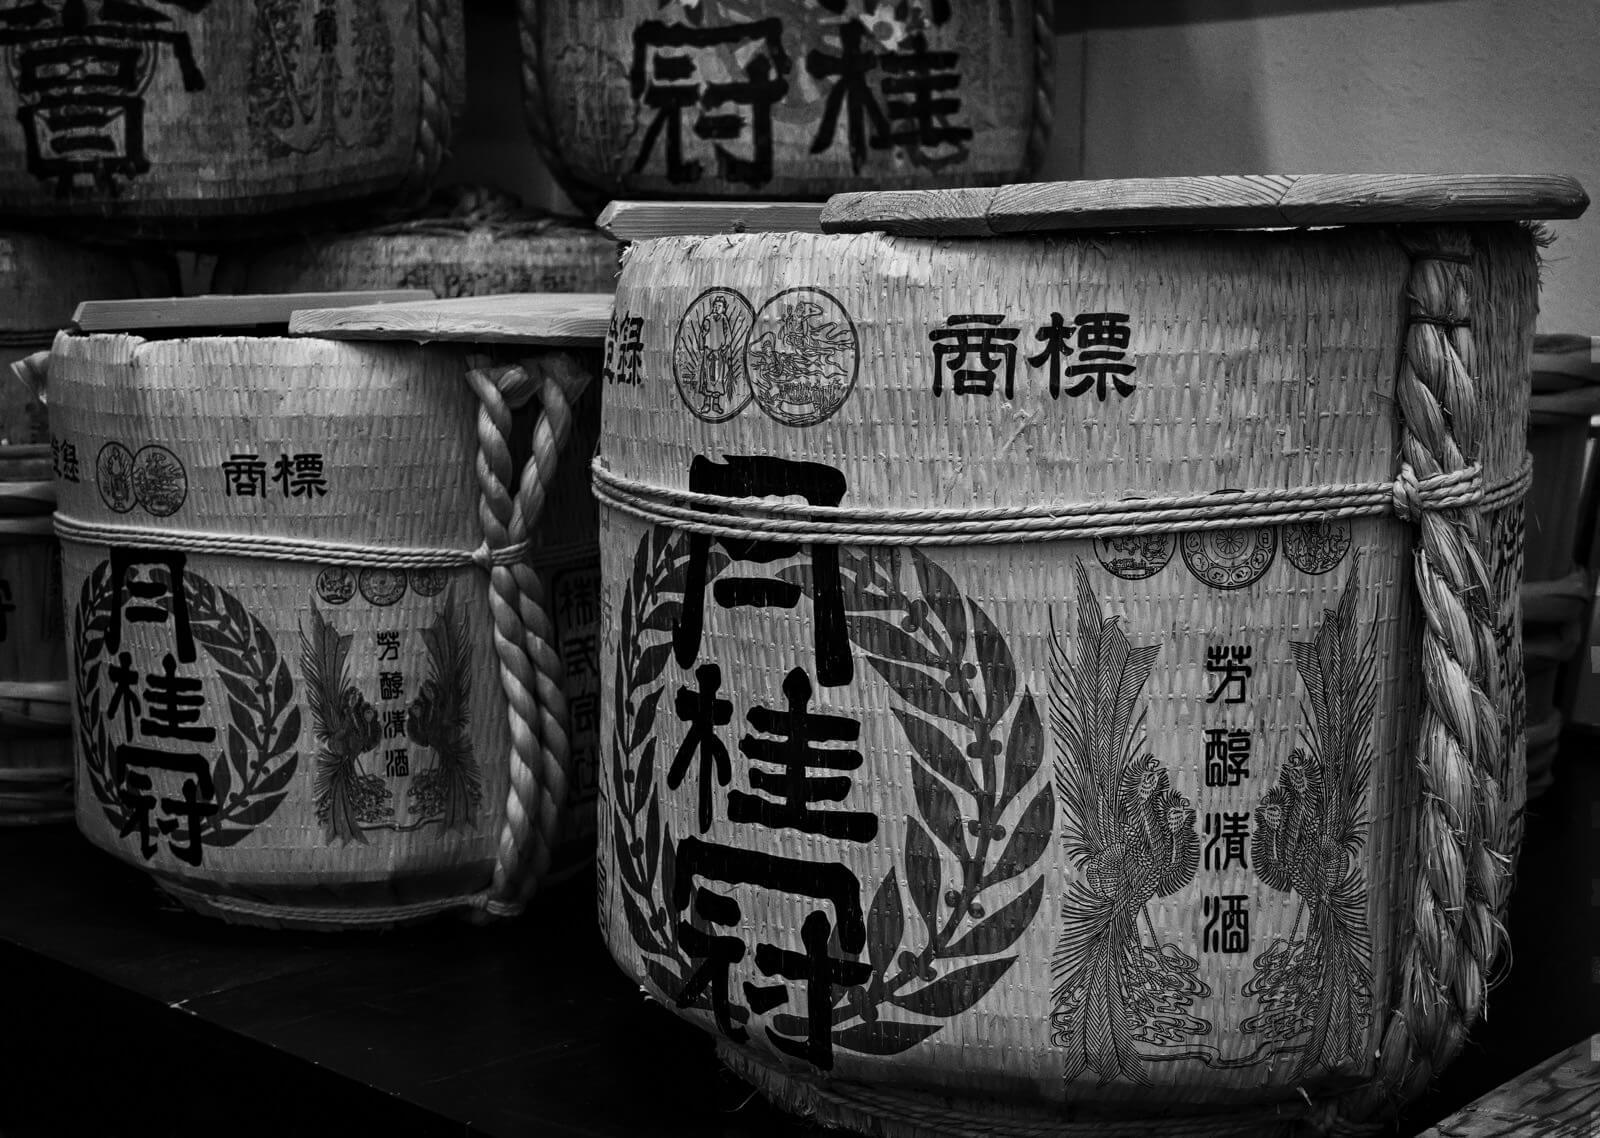 Sake barrels, Osaka, Japan - Photo by Zdenek Sindelar of CuriousZed Photography